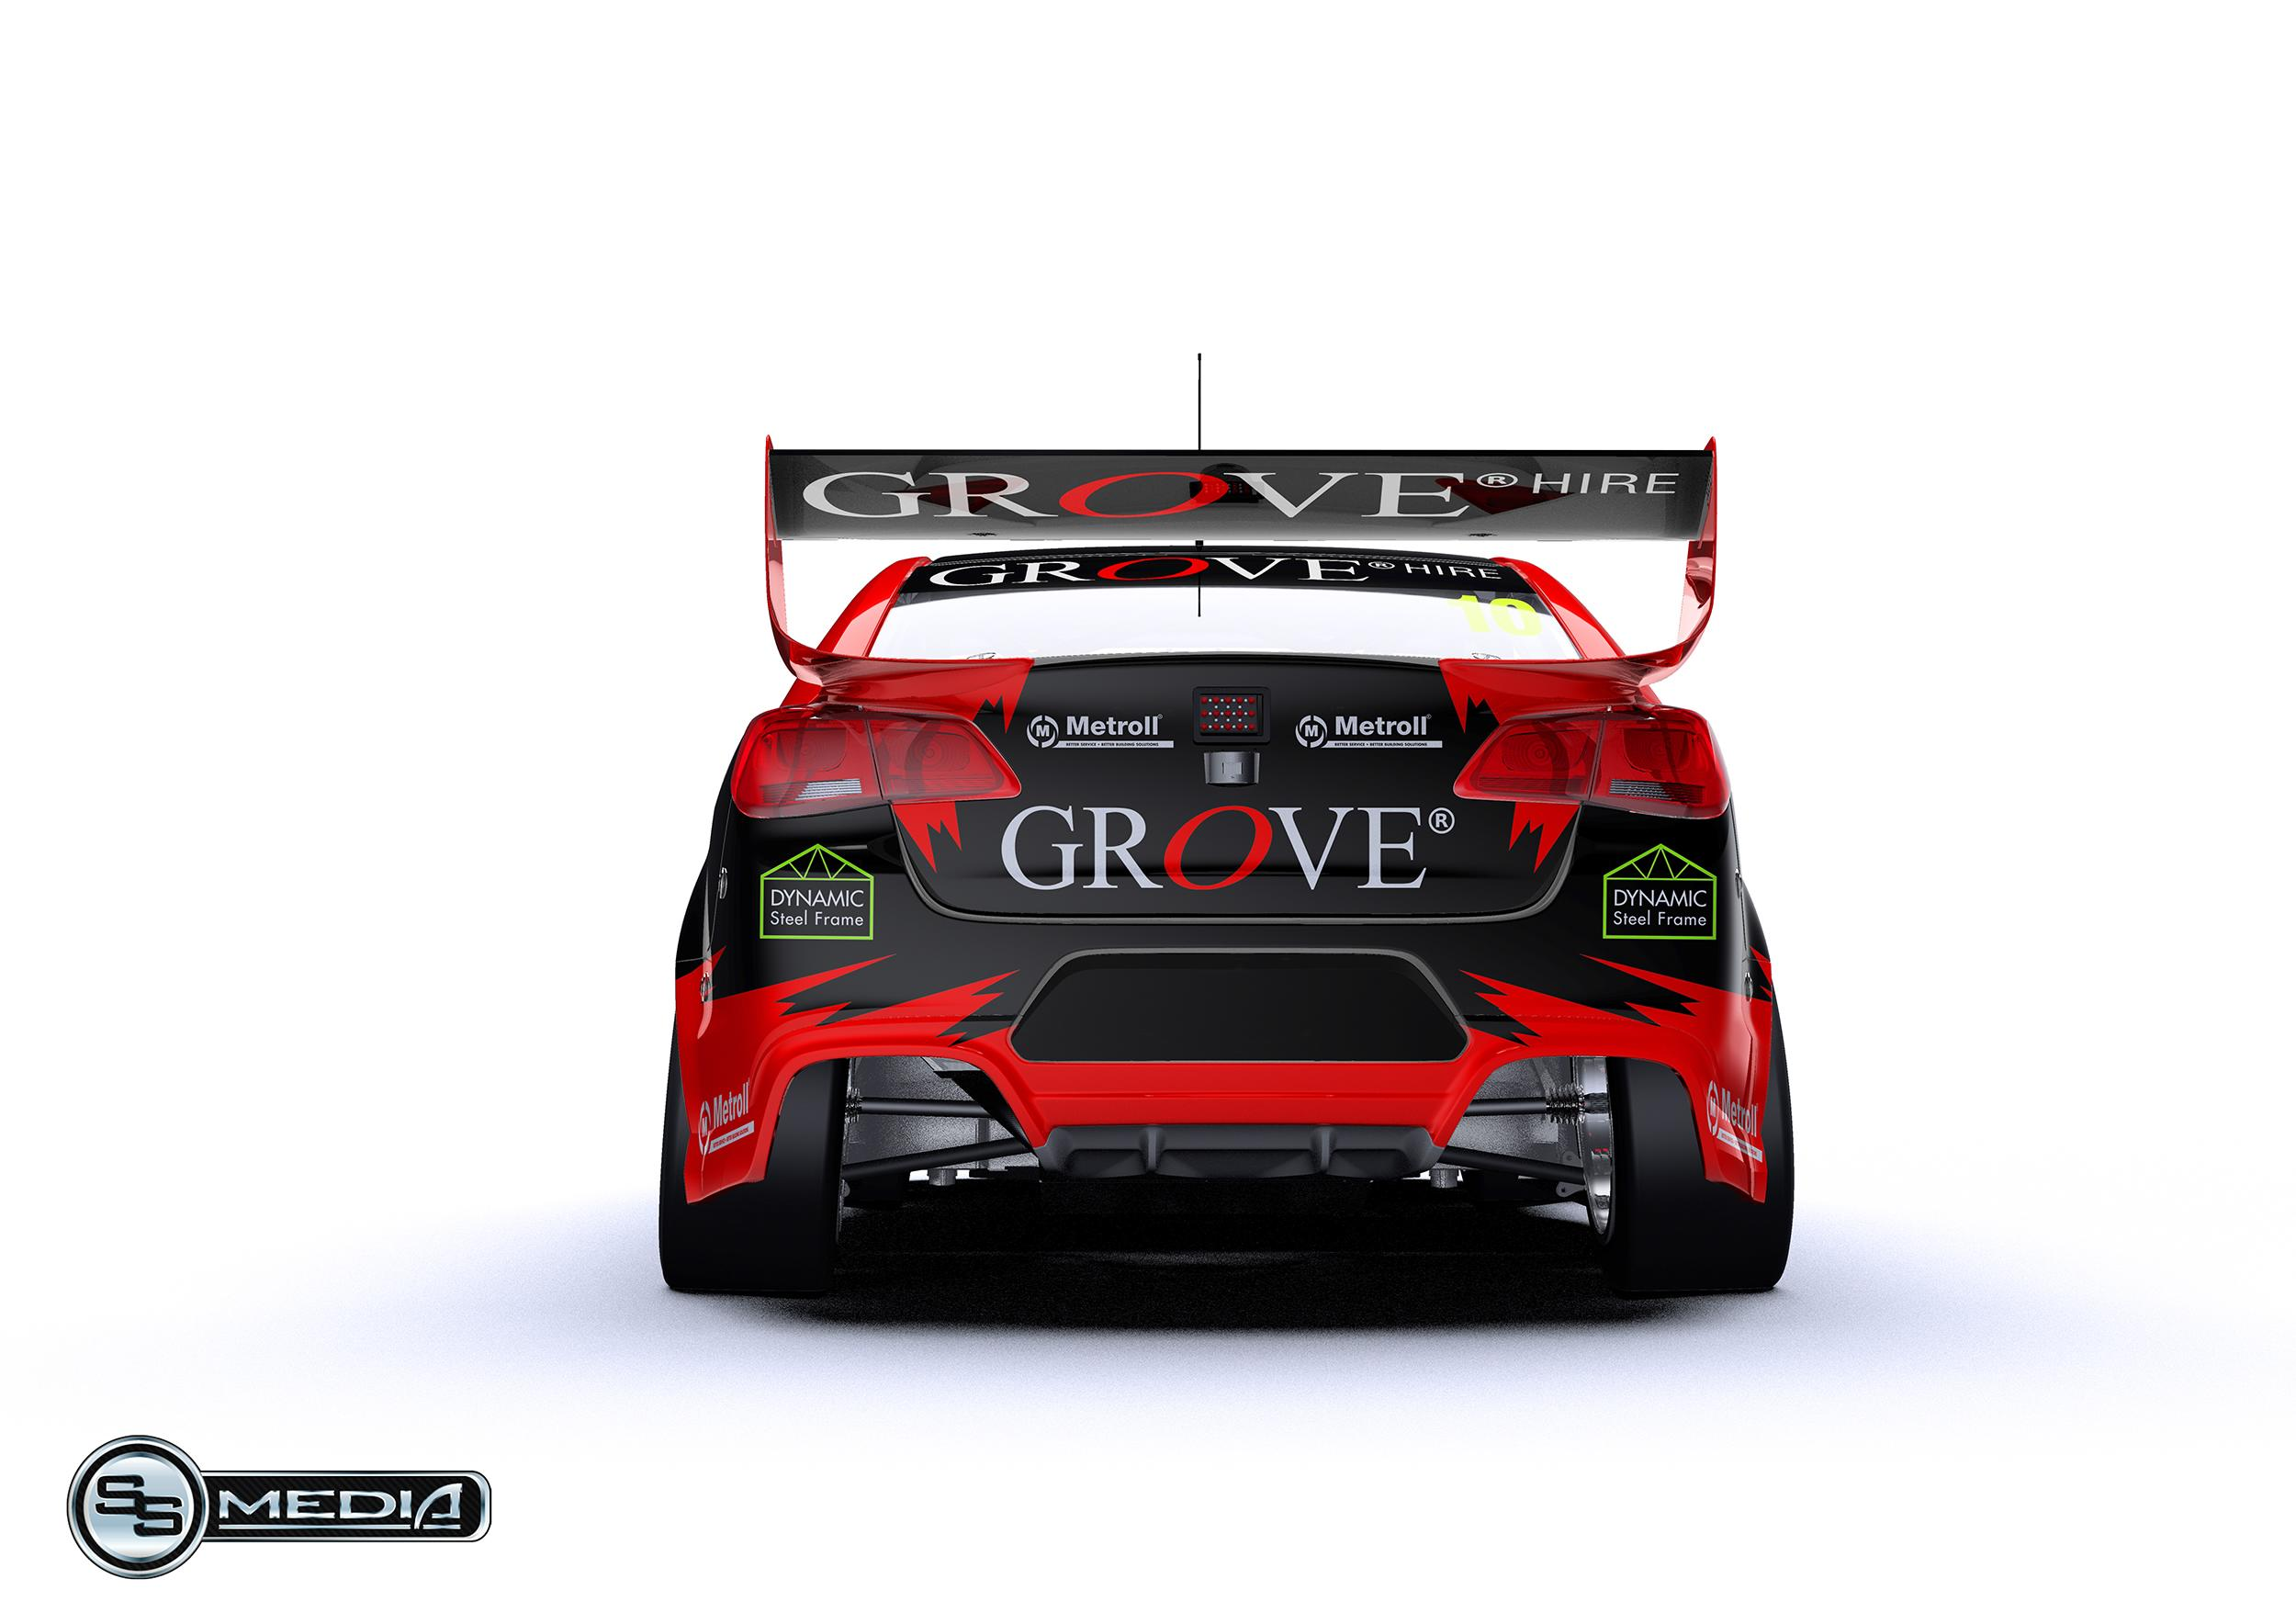 grove_racing_super2_rear.jpg